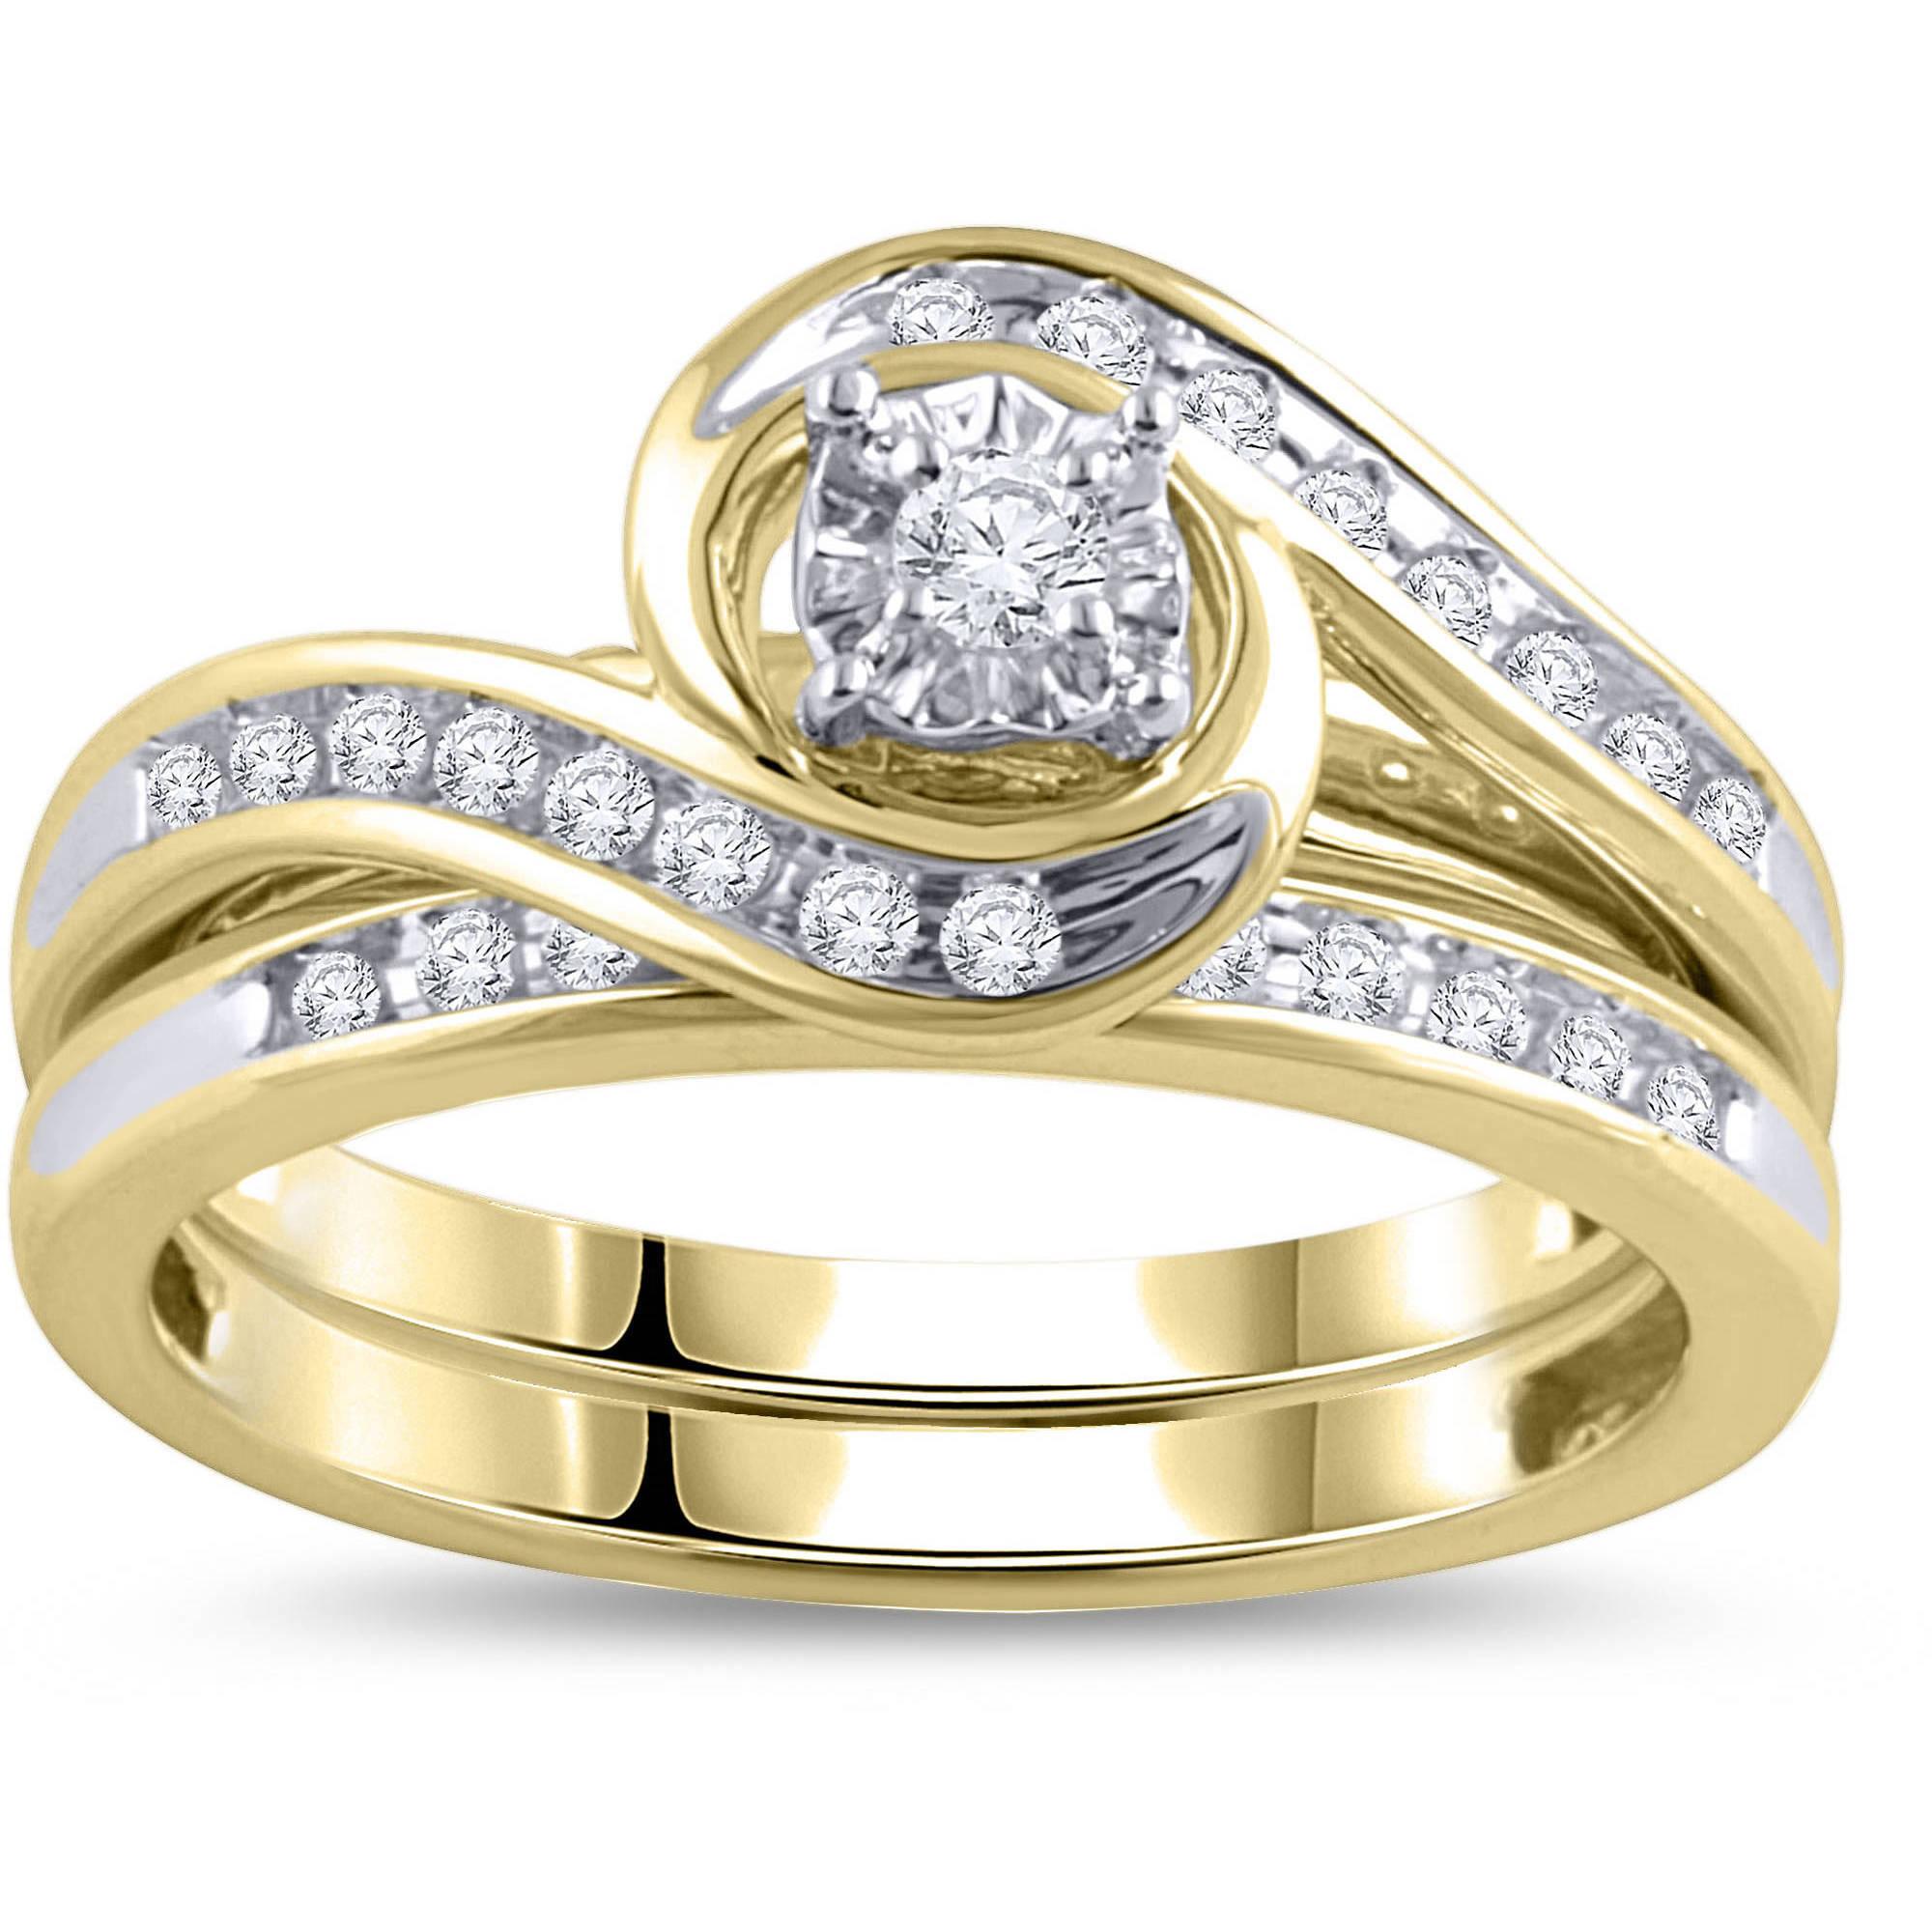 Tire Wedding Rings >> 1/3 Carat Diamond Yellow Gold Bypass Bridal Ring Set - Walmart.com